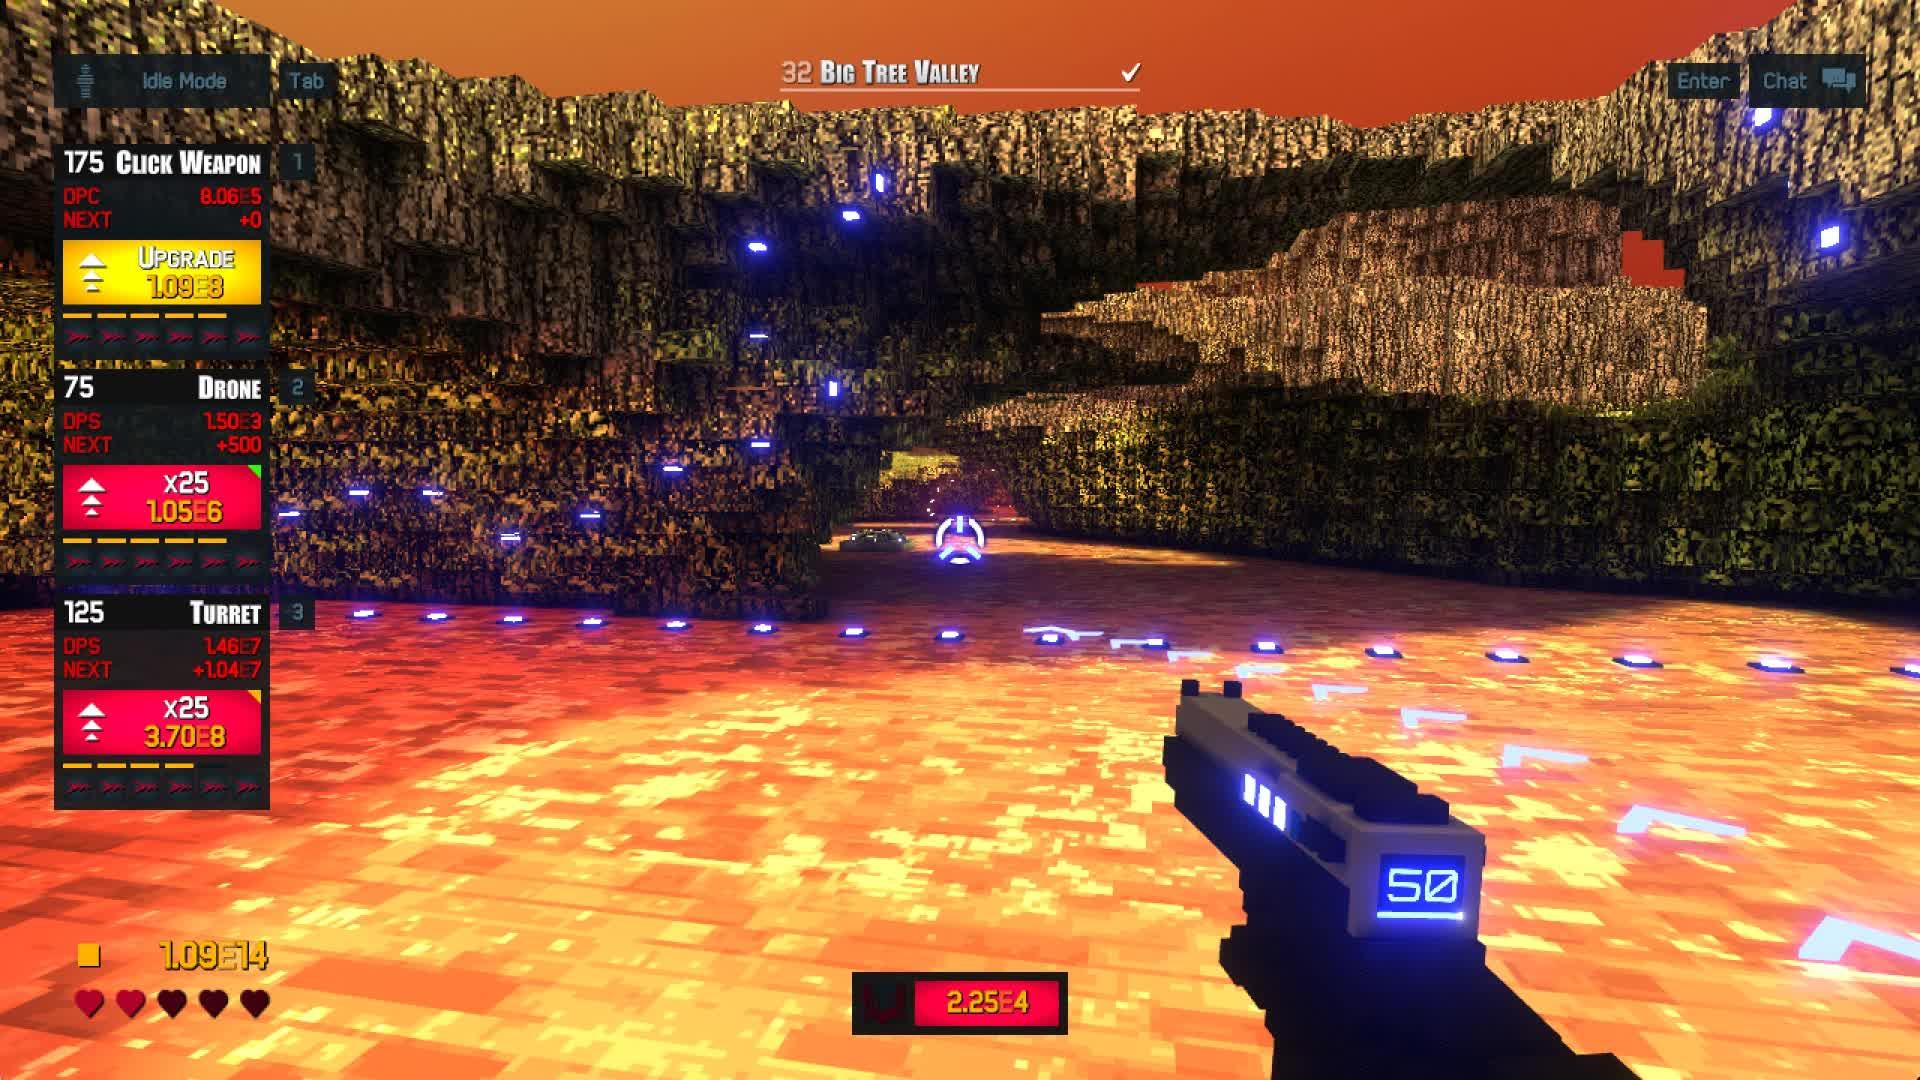 Clicker, FPS, Game, Incremental, Proton Studio, RPG, Time Clickers 2, Time Warpers, Video Game, Time Warpers Evening GIFs